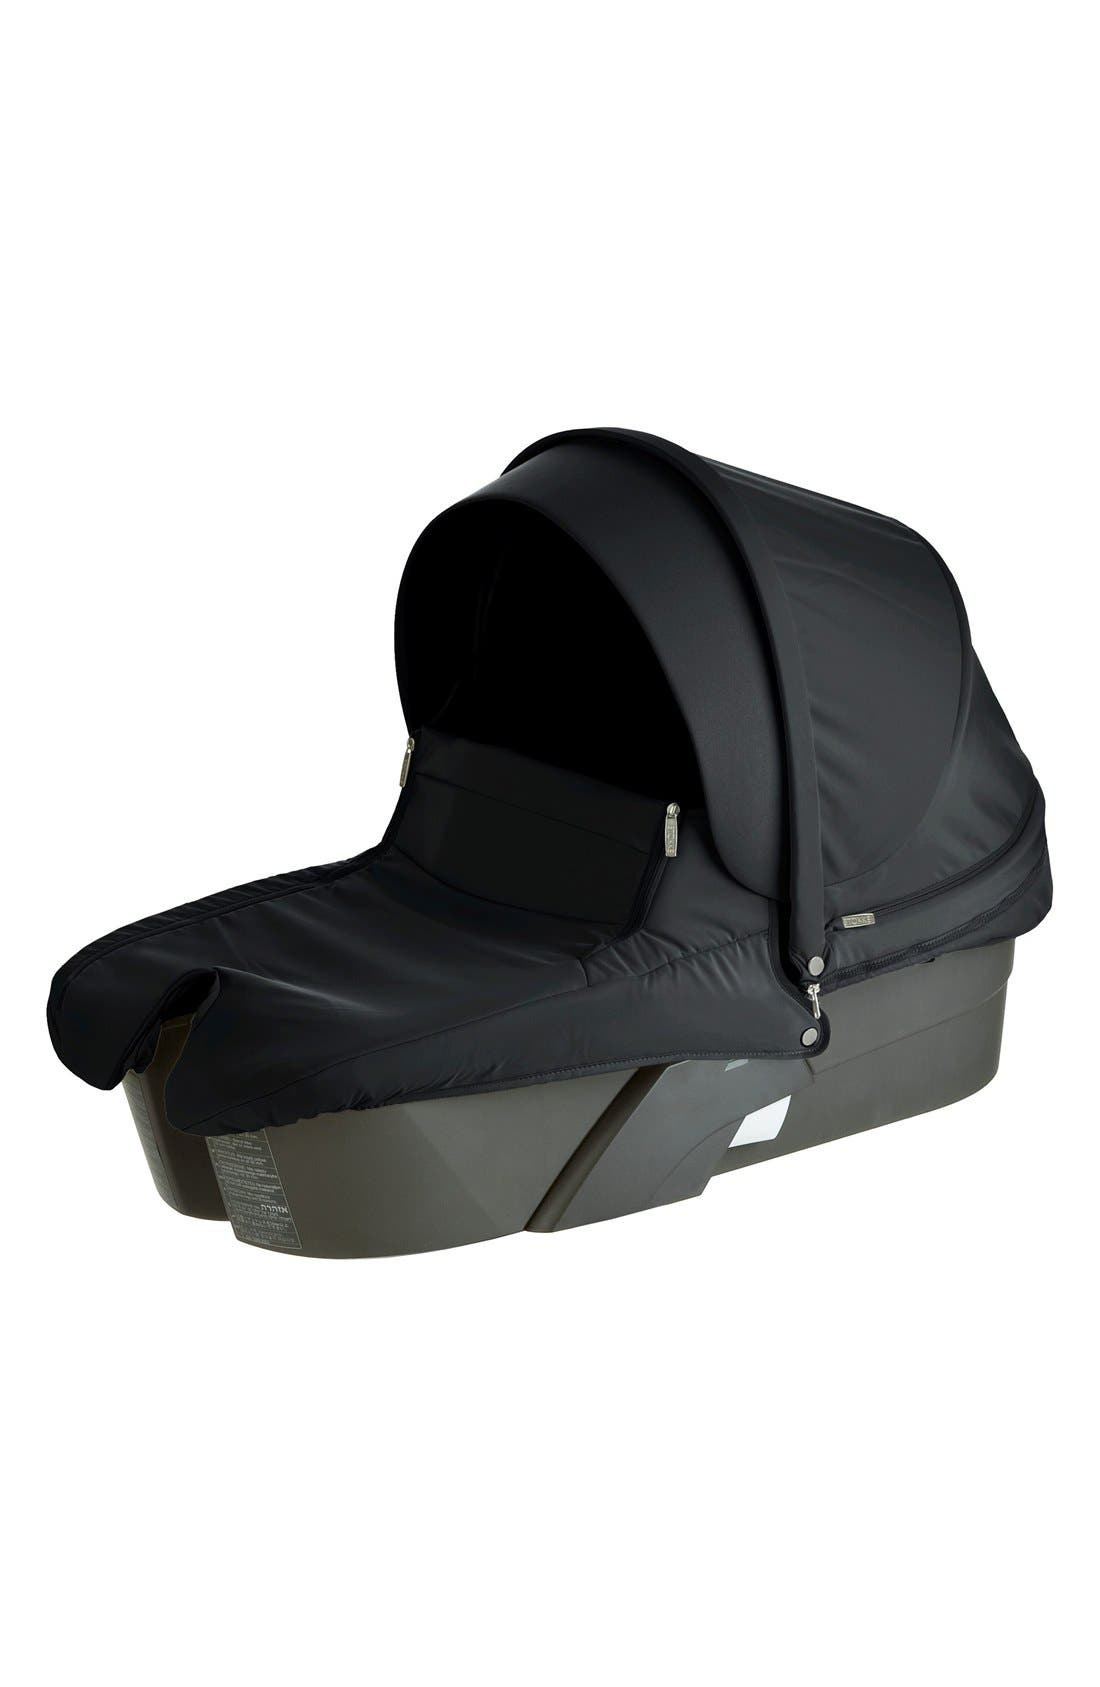 'Xplory<sup>®</sup>' Stroller Carry Cot,                         Main,                         color, Black